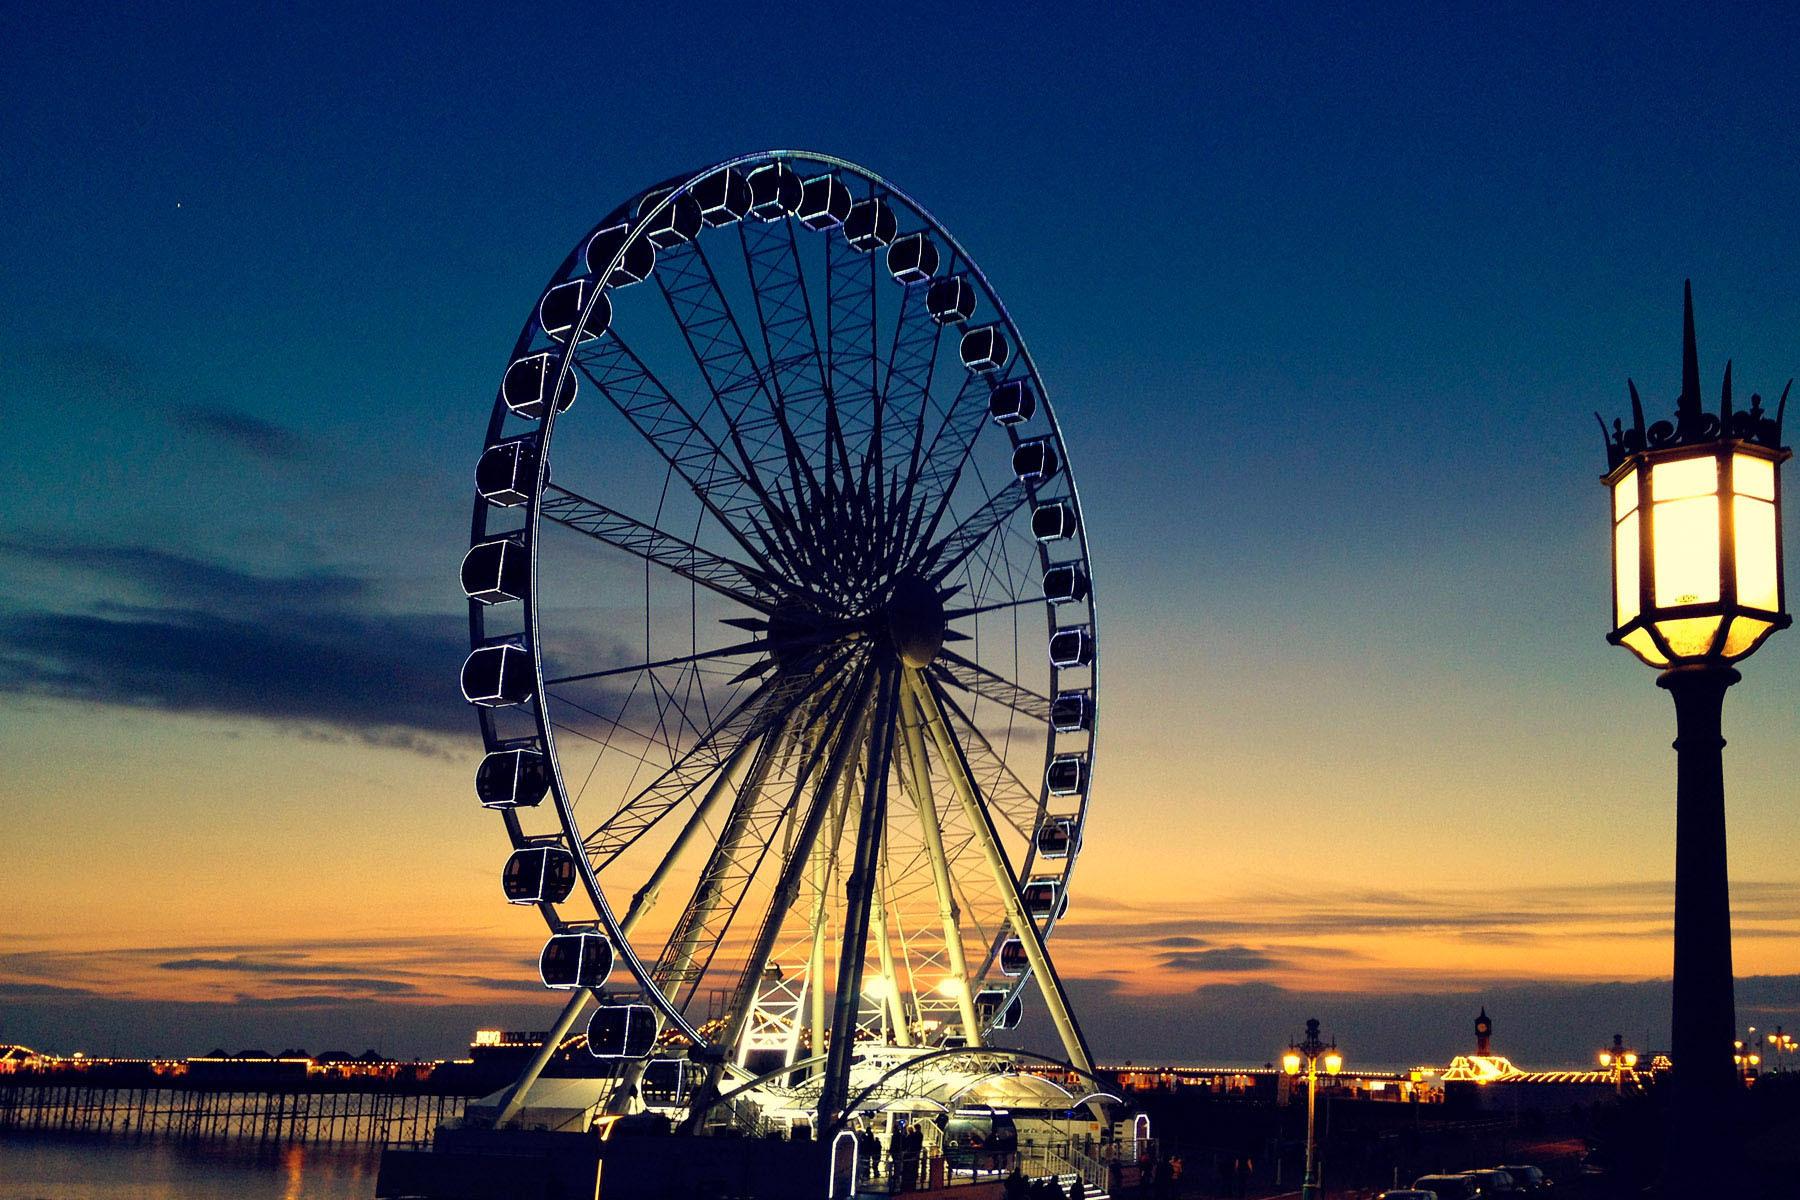 Brighton Wheel at Night, Brighton, East Sussex, England